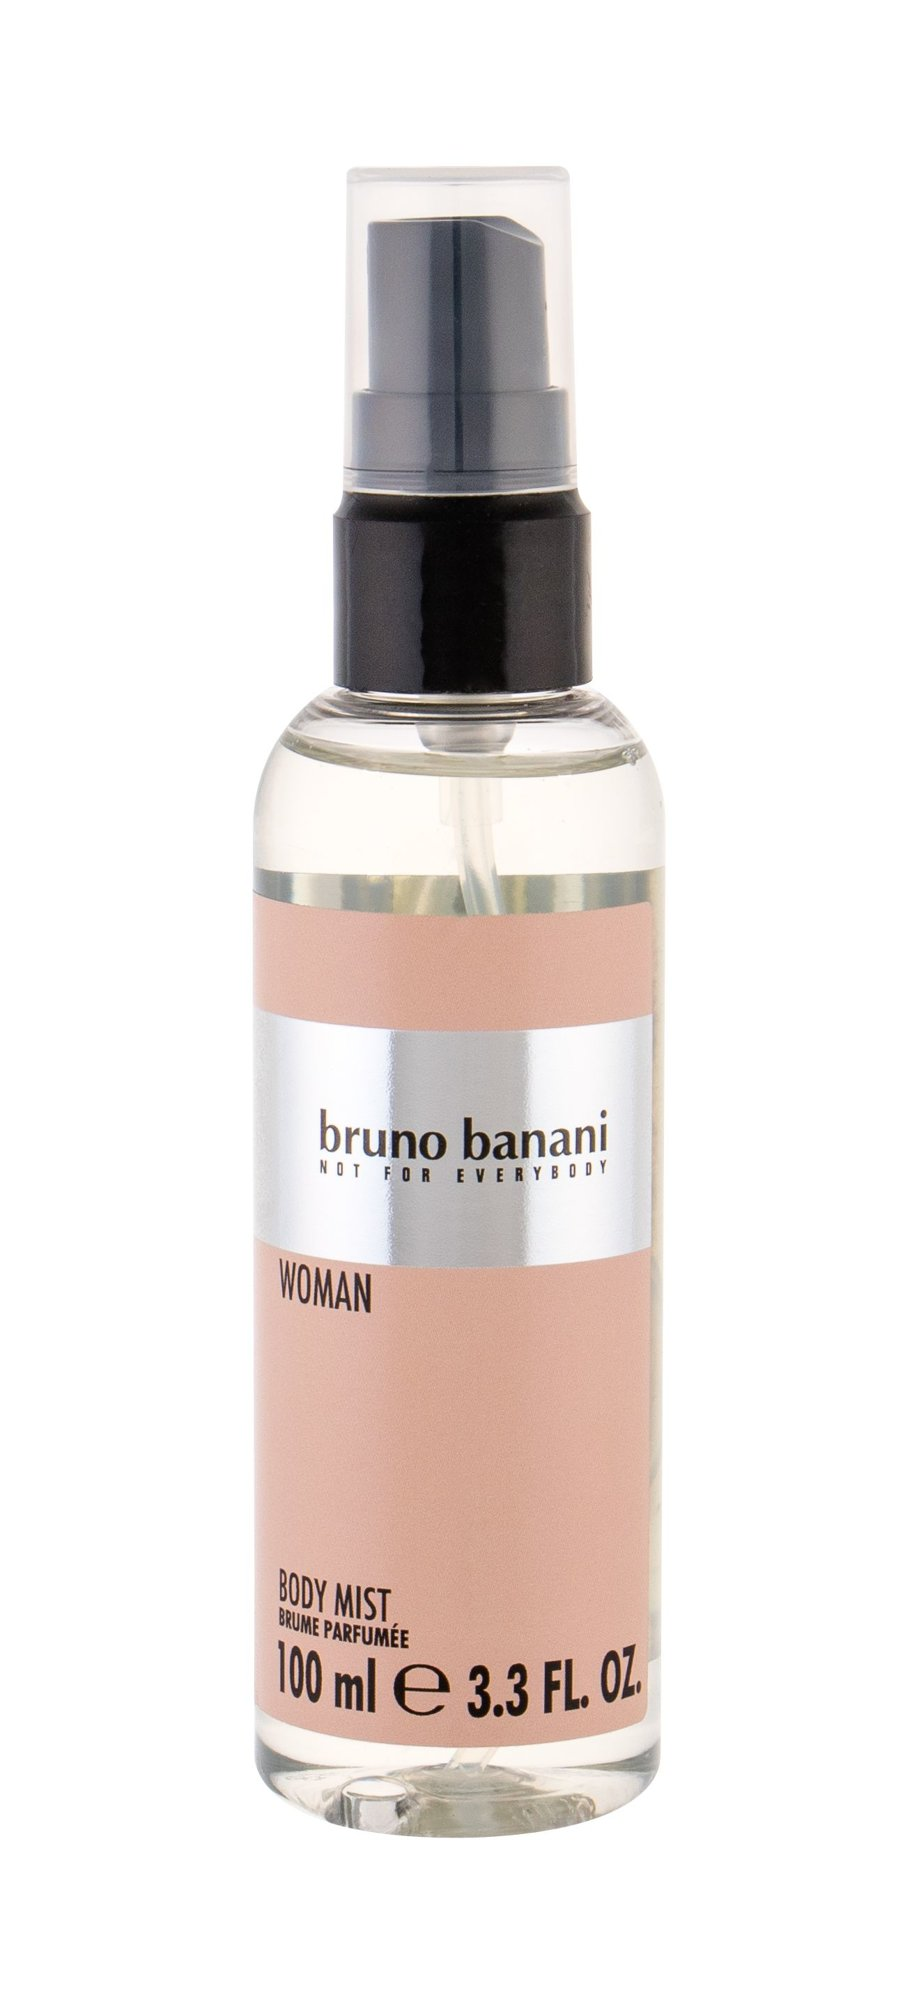 Bruno Banani Woman Body Veil 100ml